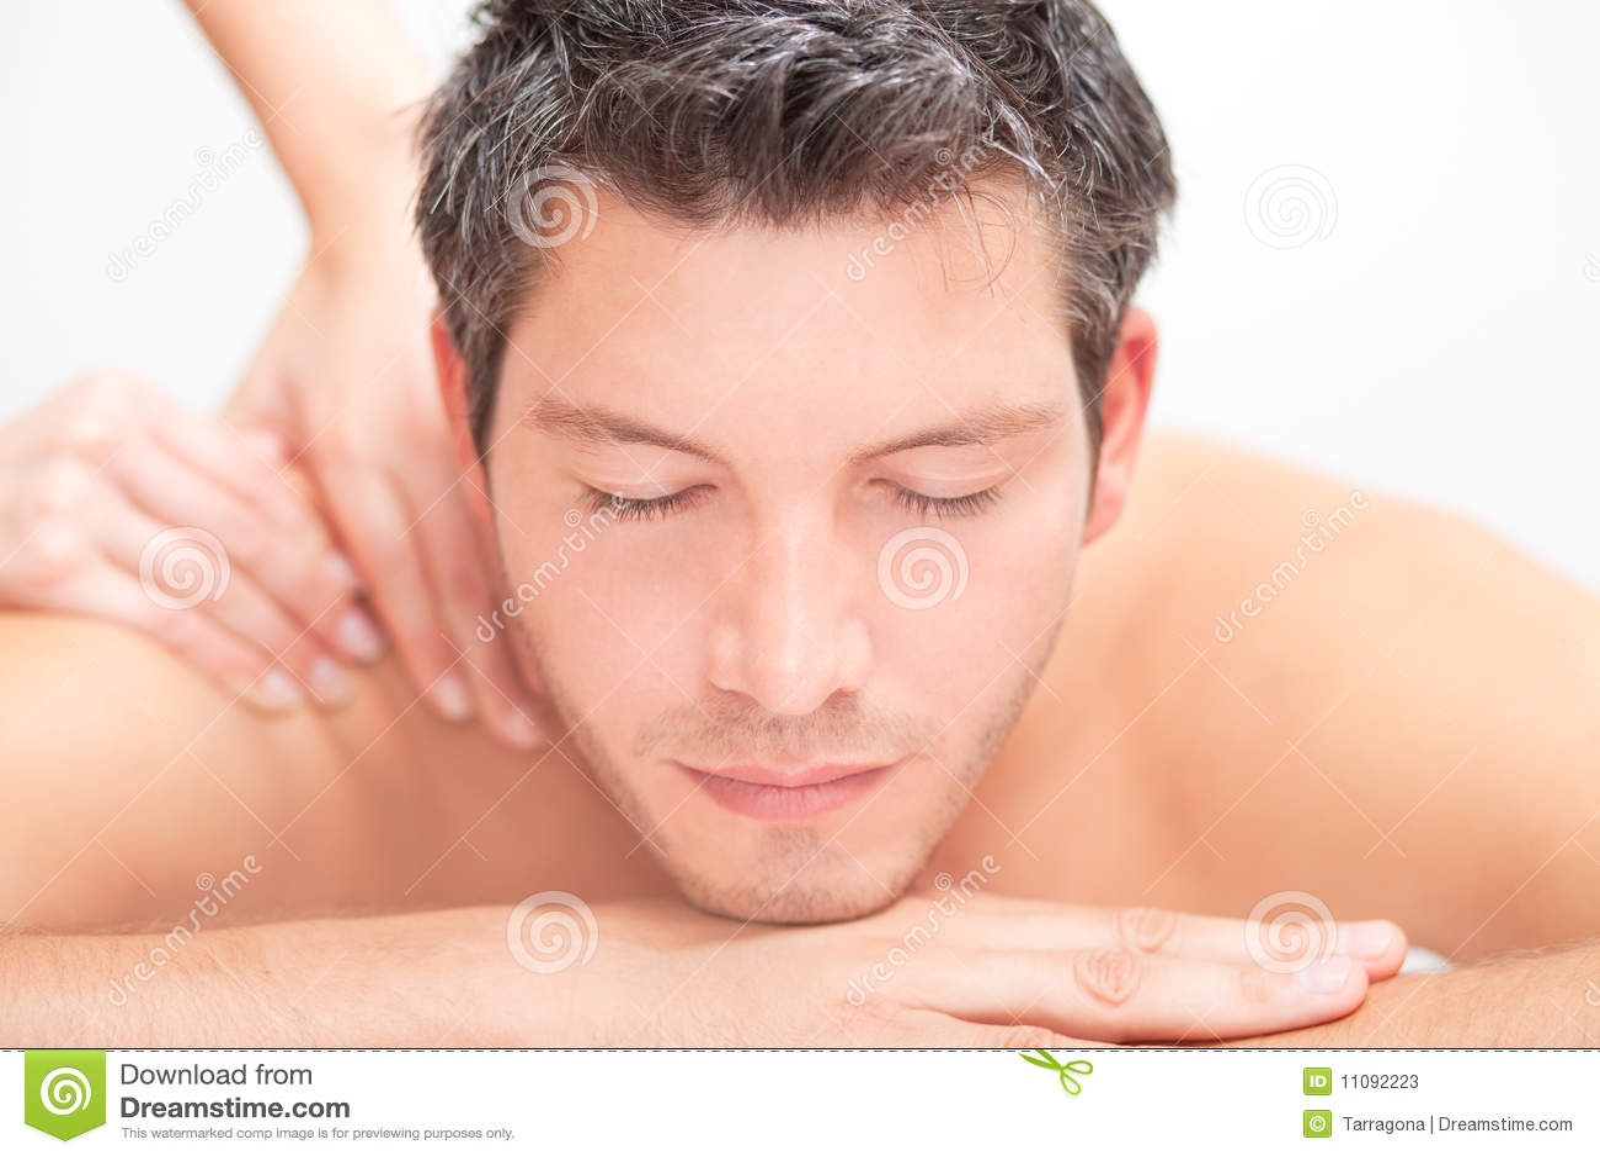 masseur men